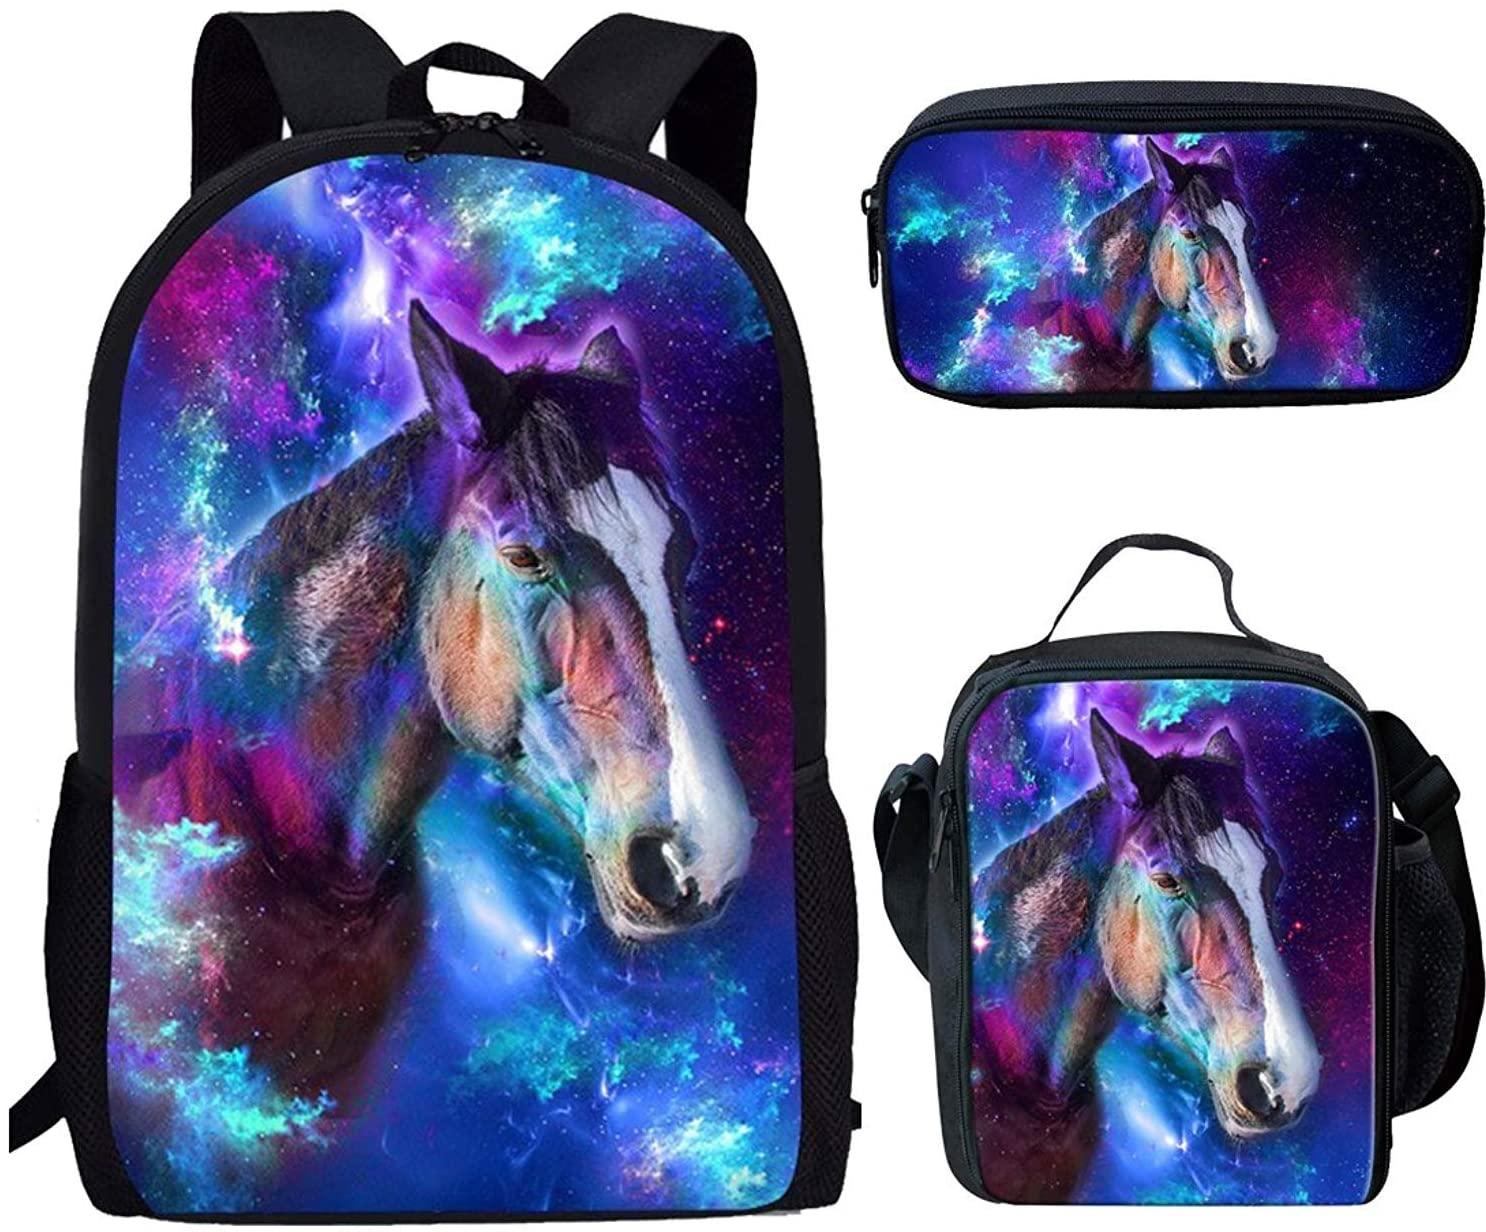 FOR U DESIGNS Universe Horse Backpack Set 3 Piece,High School Backpack for Women Teen Girls